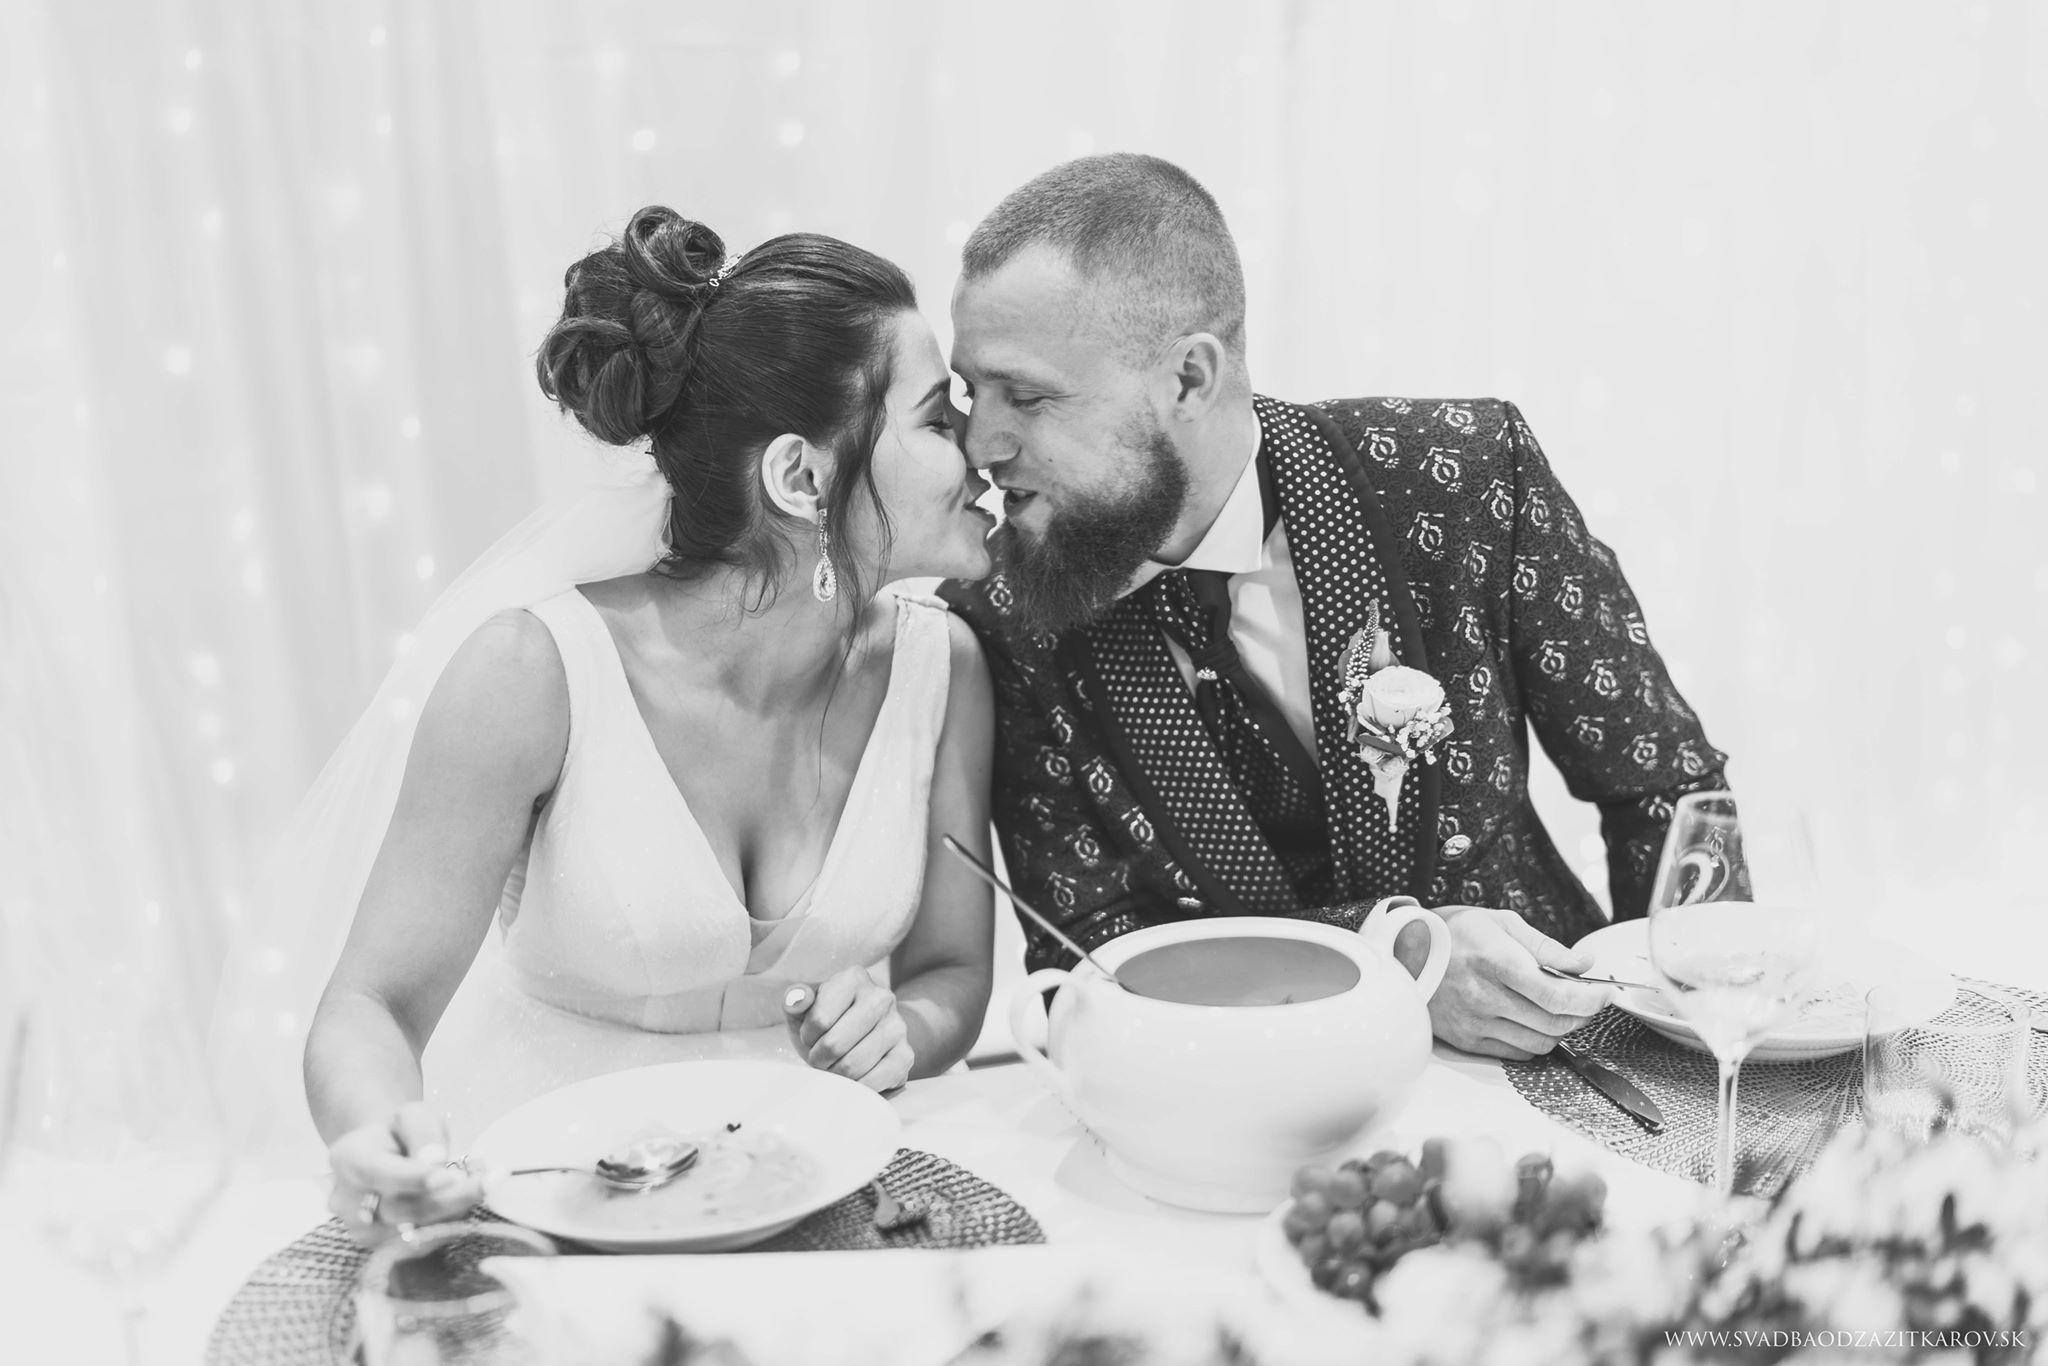 svadba-mladomanzelnia-wedding-slovakia-topjpg